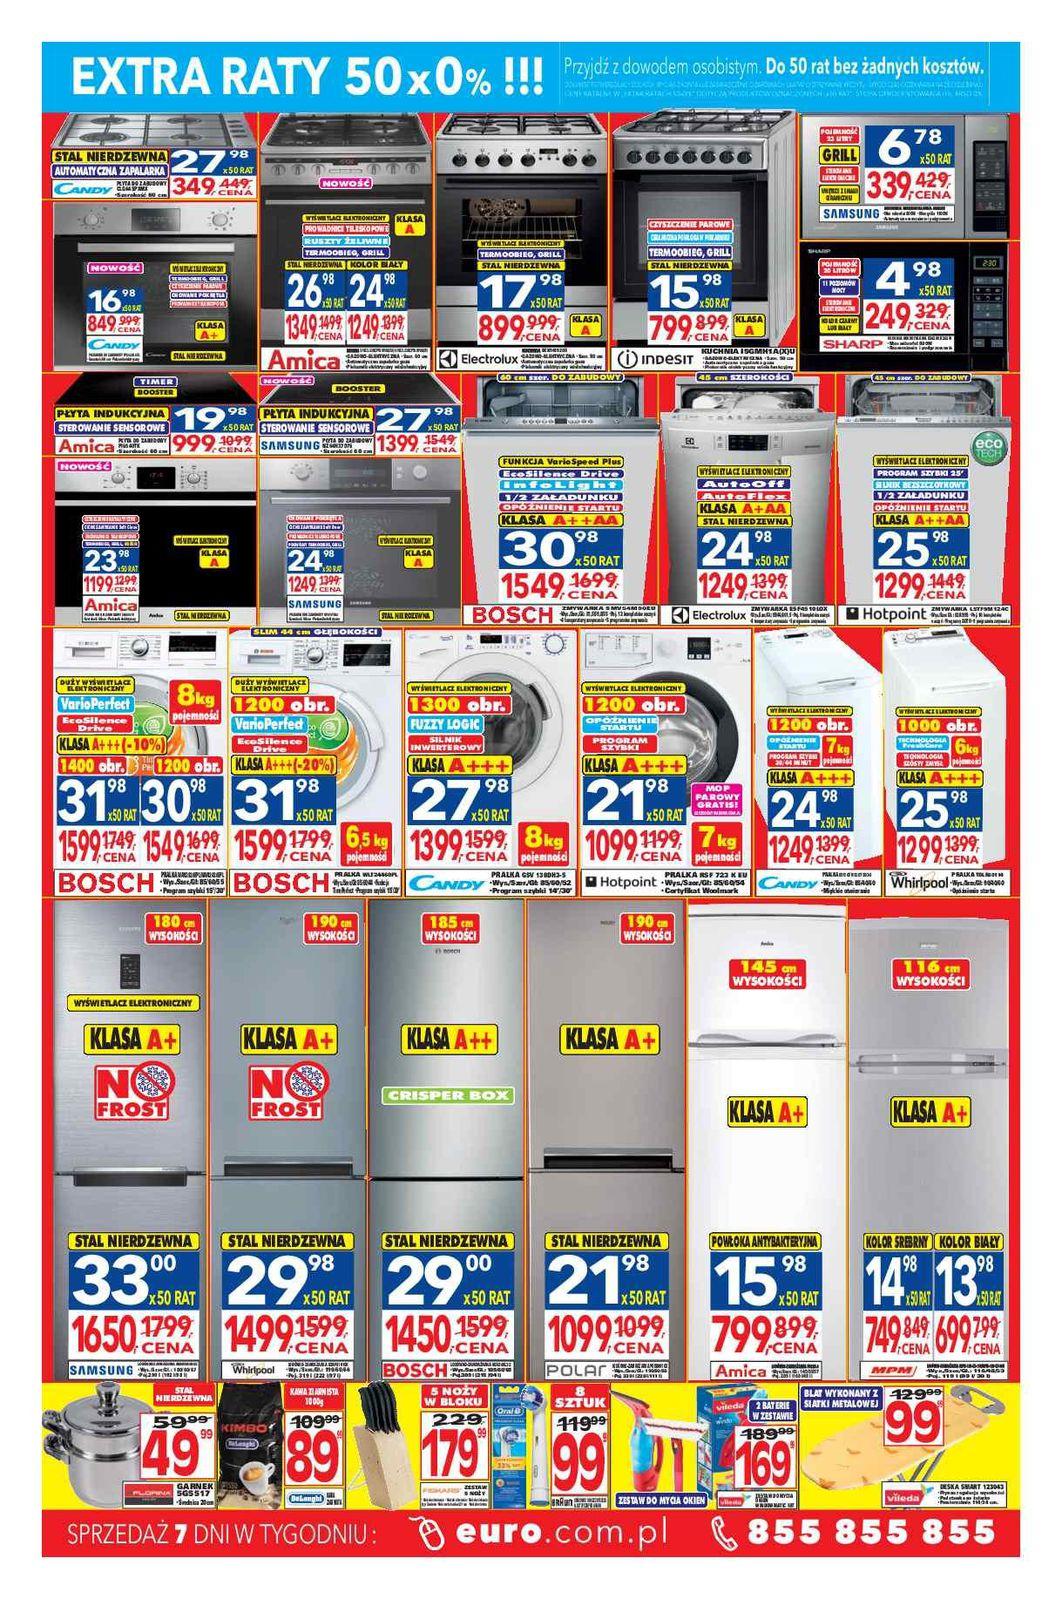 Gazetka promocyjna RTV Euro AGD do 10/05/2016 str.1